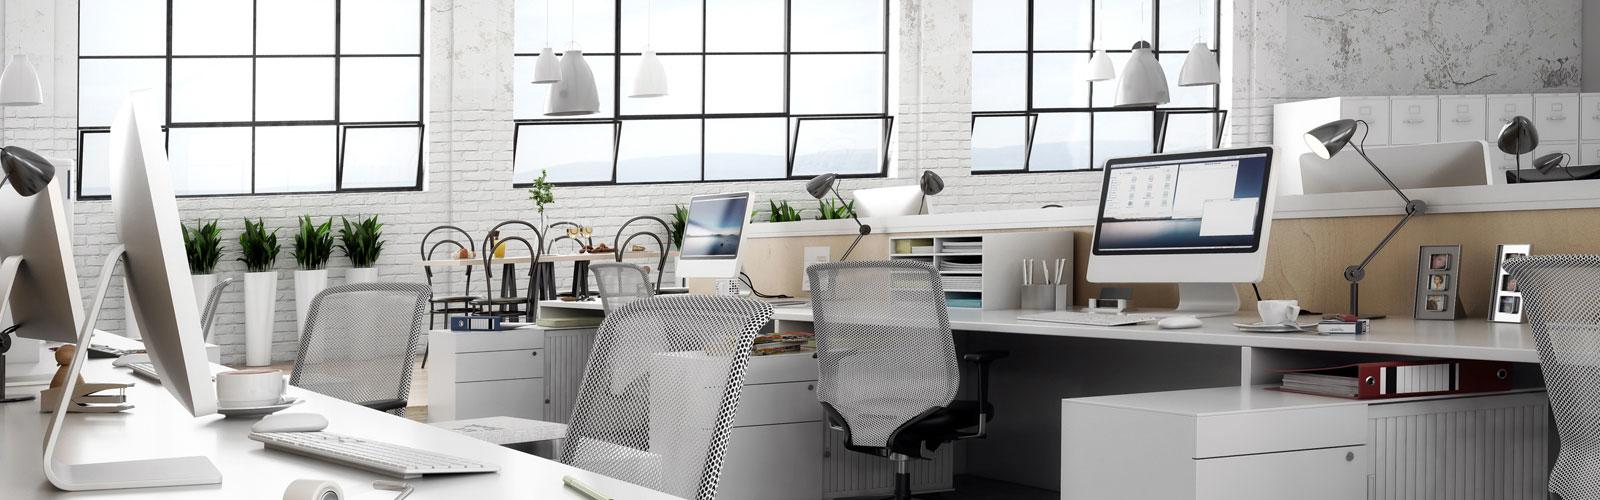 Helles, modernes Büro